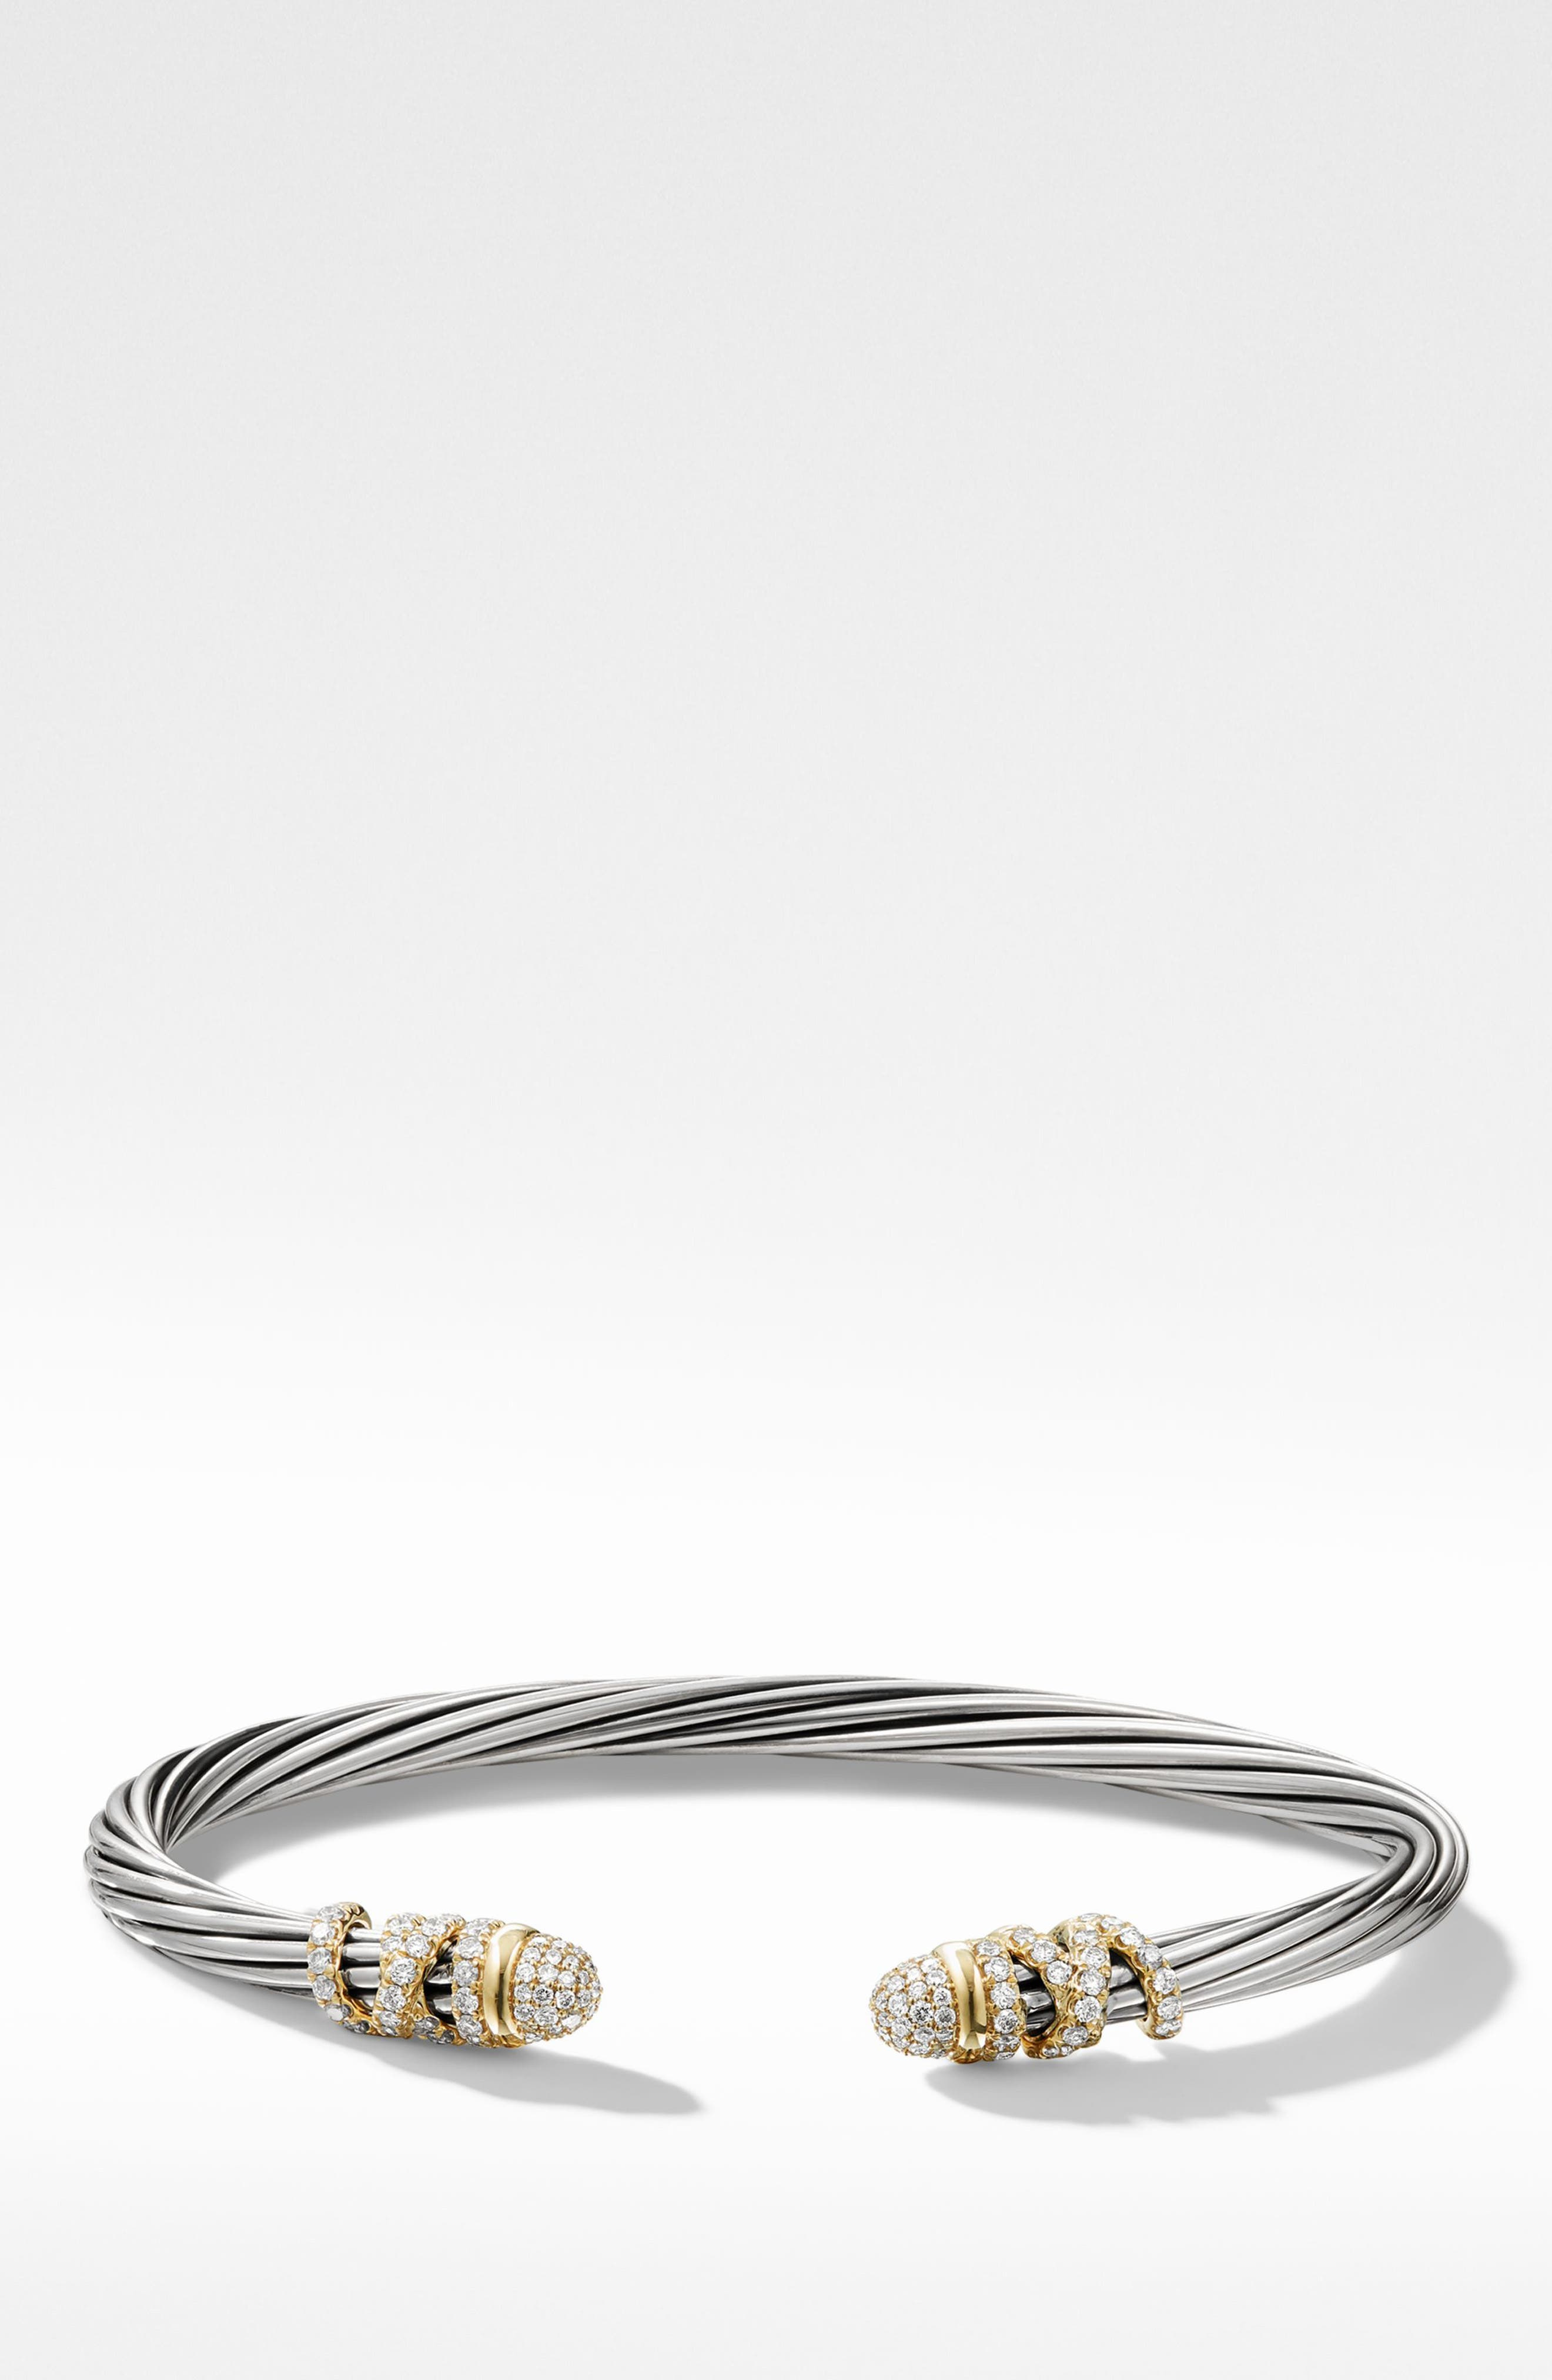 Helena Bracelet with Diamonds,                         Main,                         color, GOLD/ SILVER/ DIAMOND